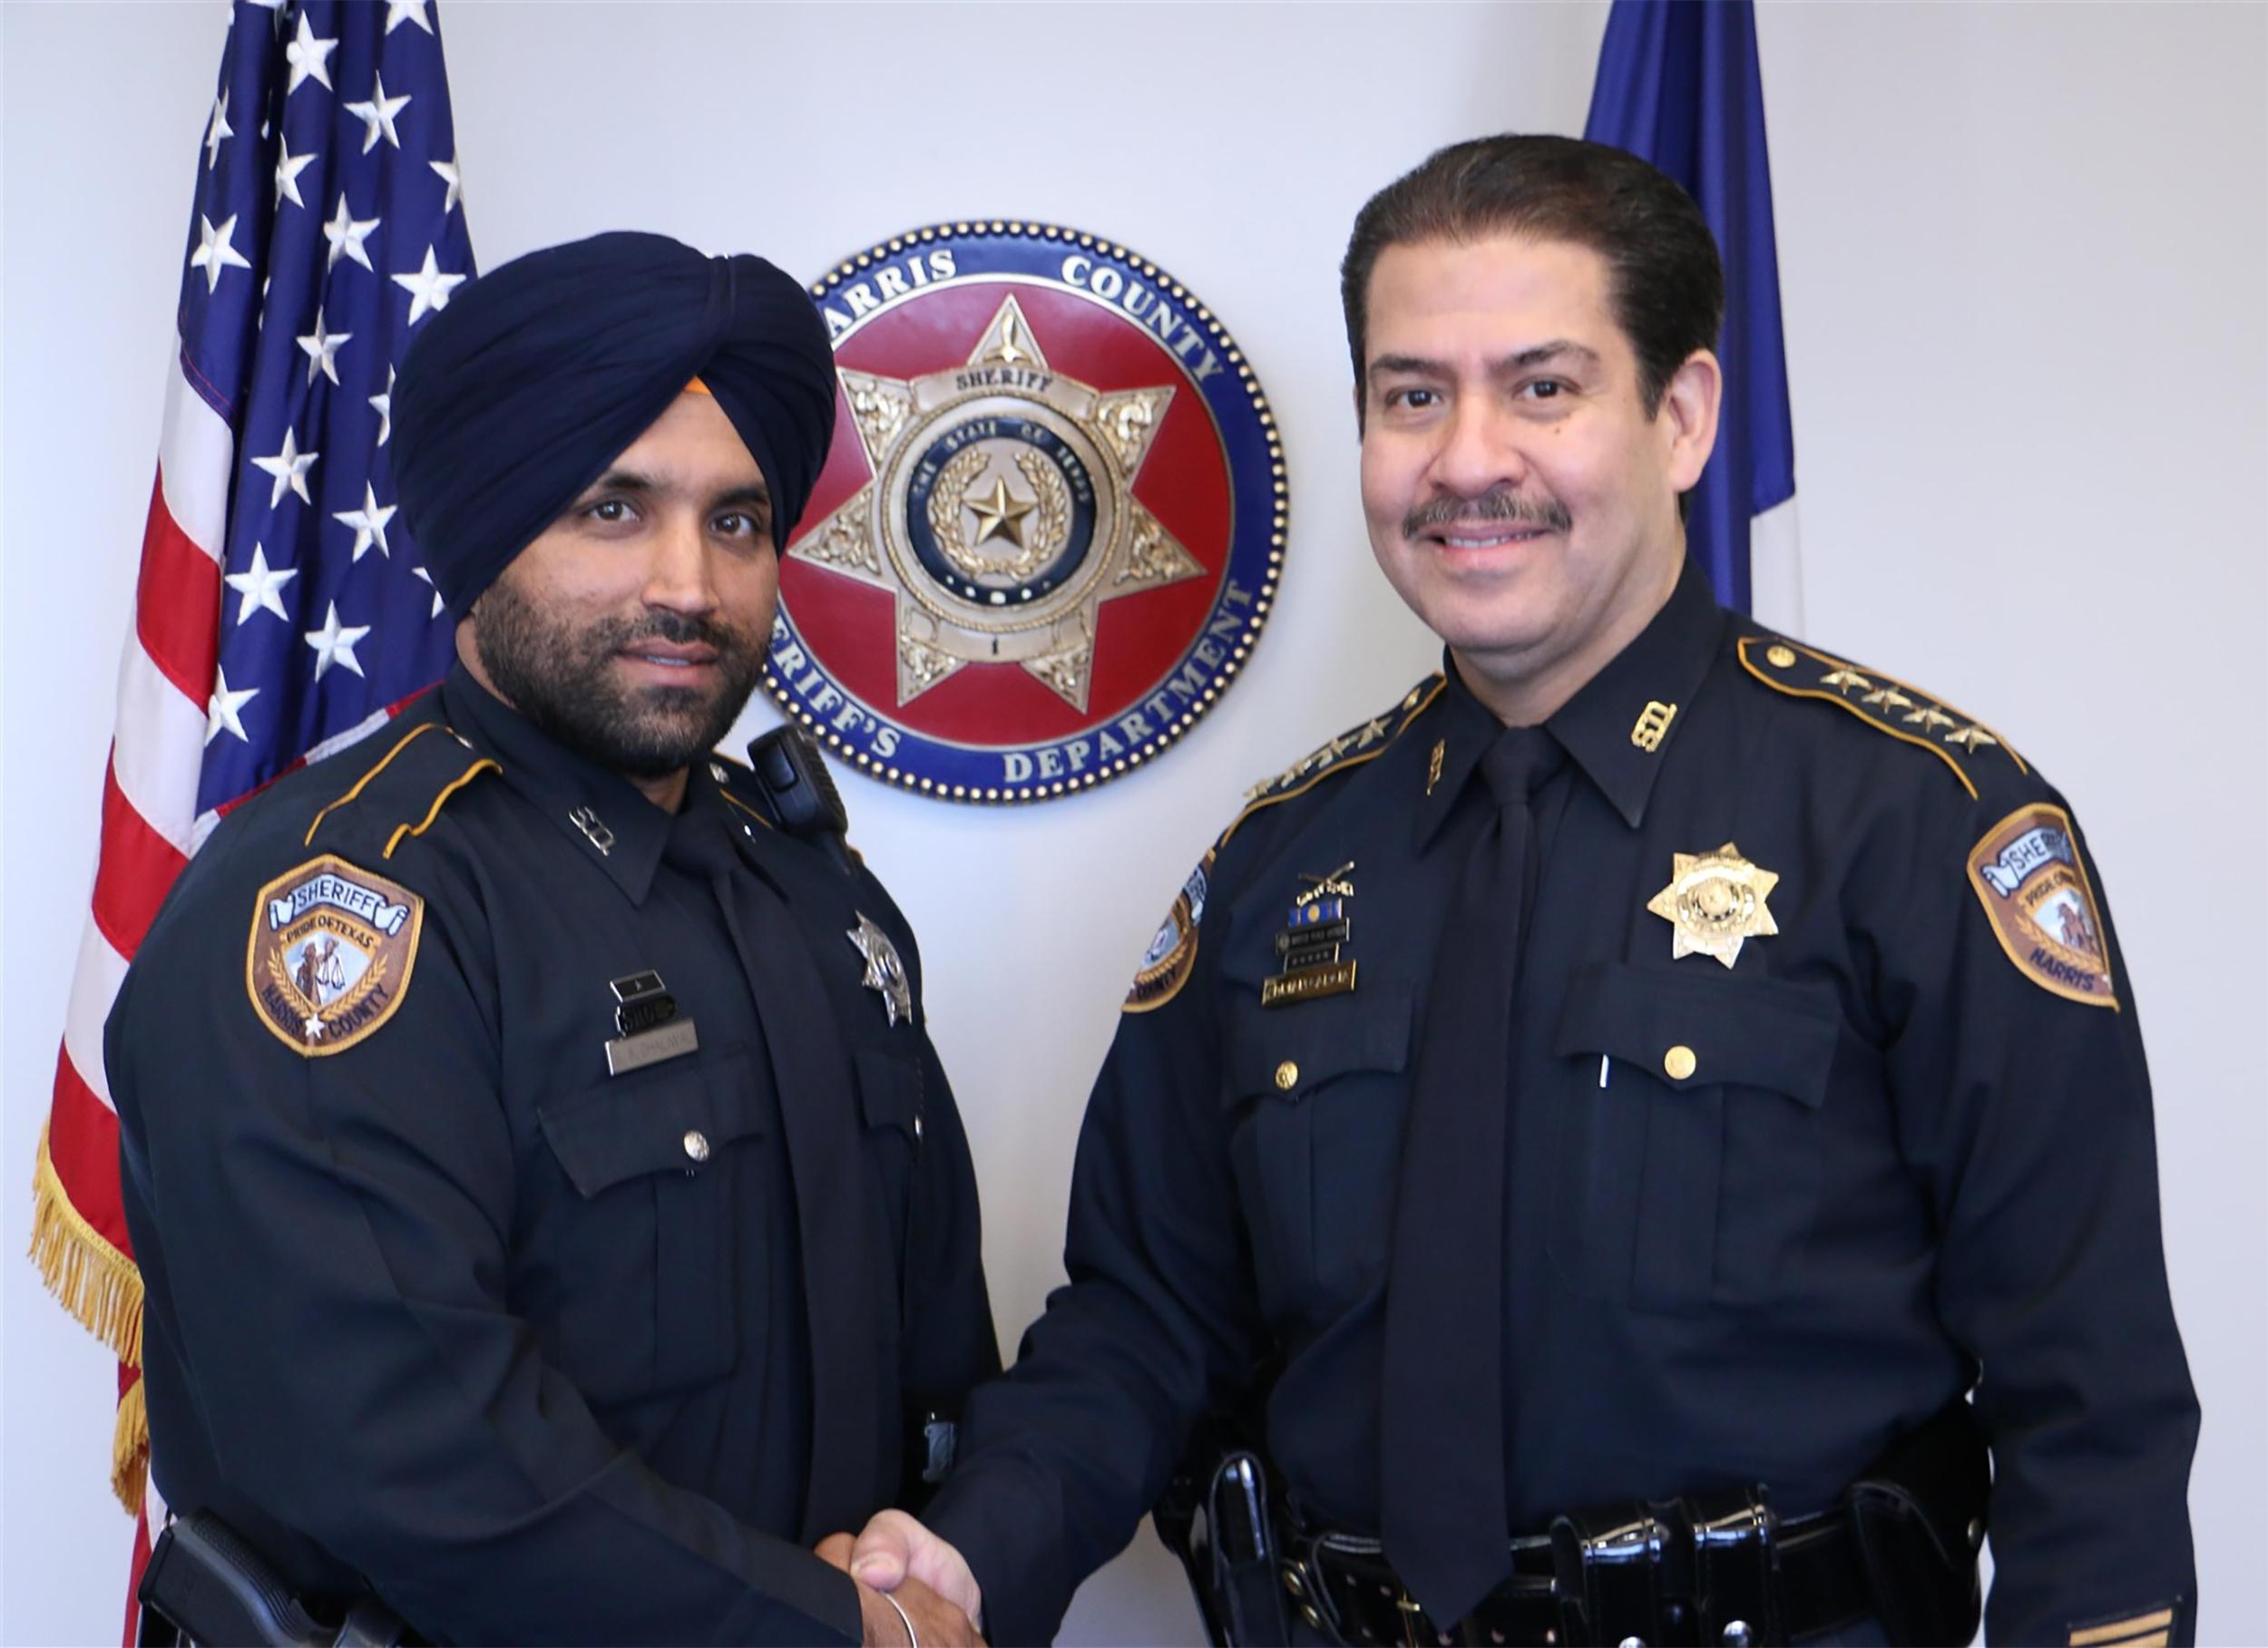 Houston department's first Sikh deputy